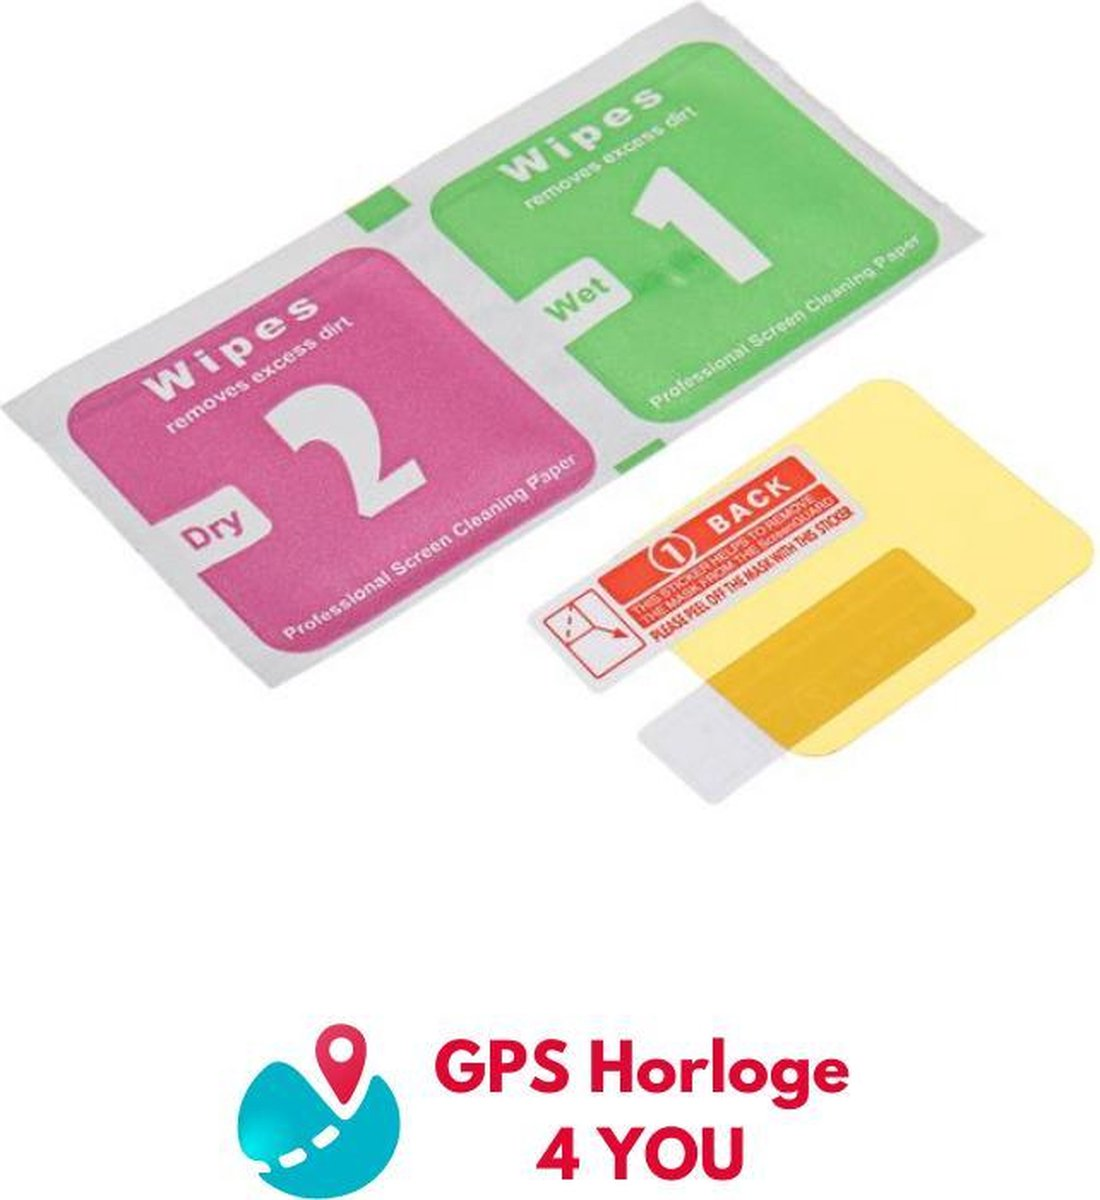 Screenprotector - GPS Horloge 4 YOU - Kinder Smartwatch - screenprotector gps horloge kind - Scherm 2inch - Wonlex horloges - Trackie Horloges